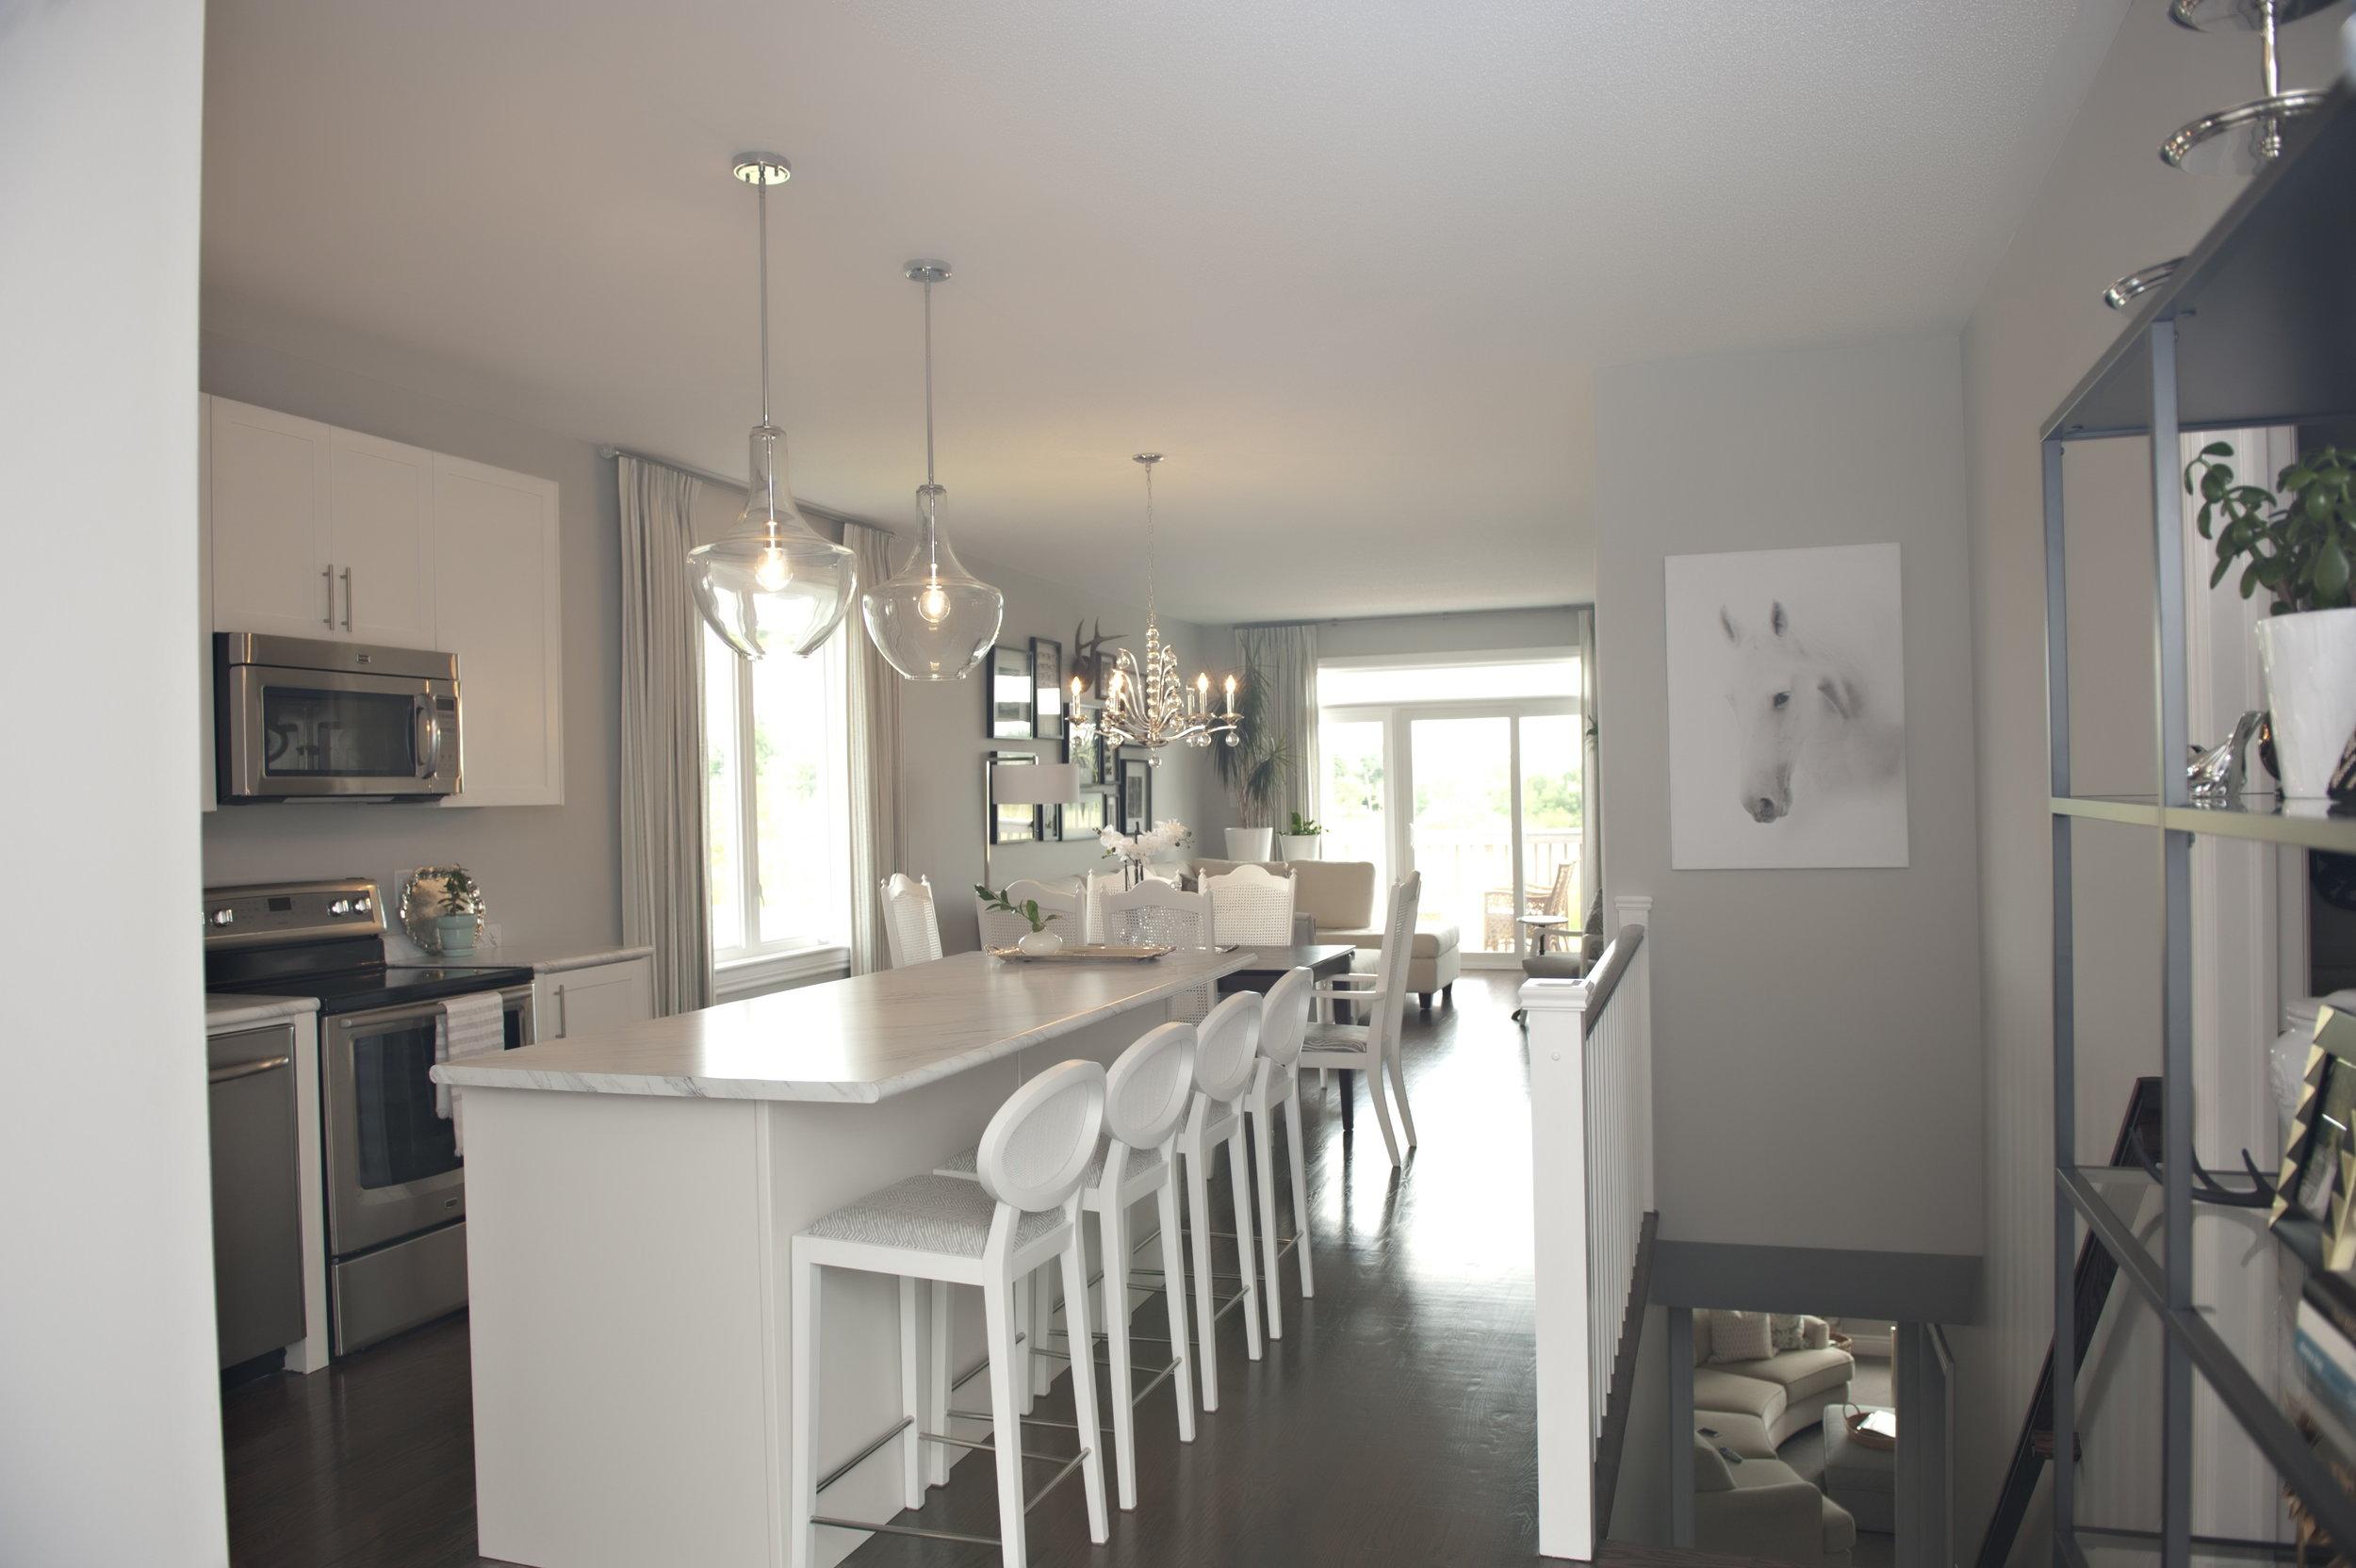 Interior-Design-Kitchen-White-Island-Seating-Kitchen